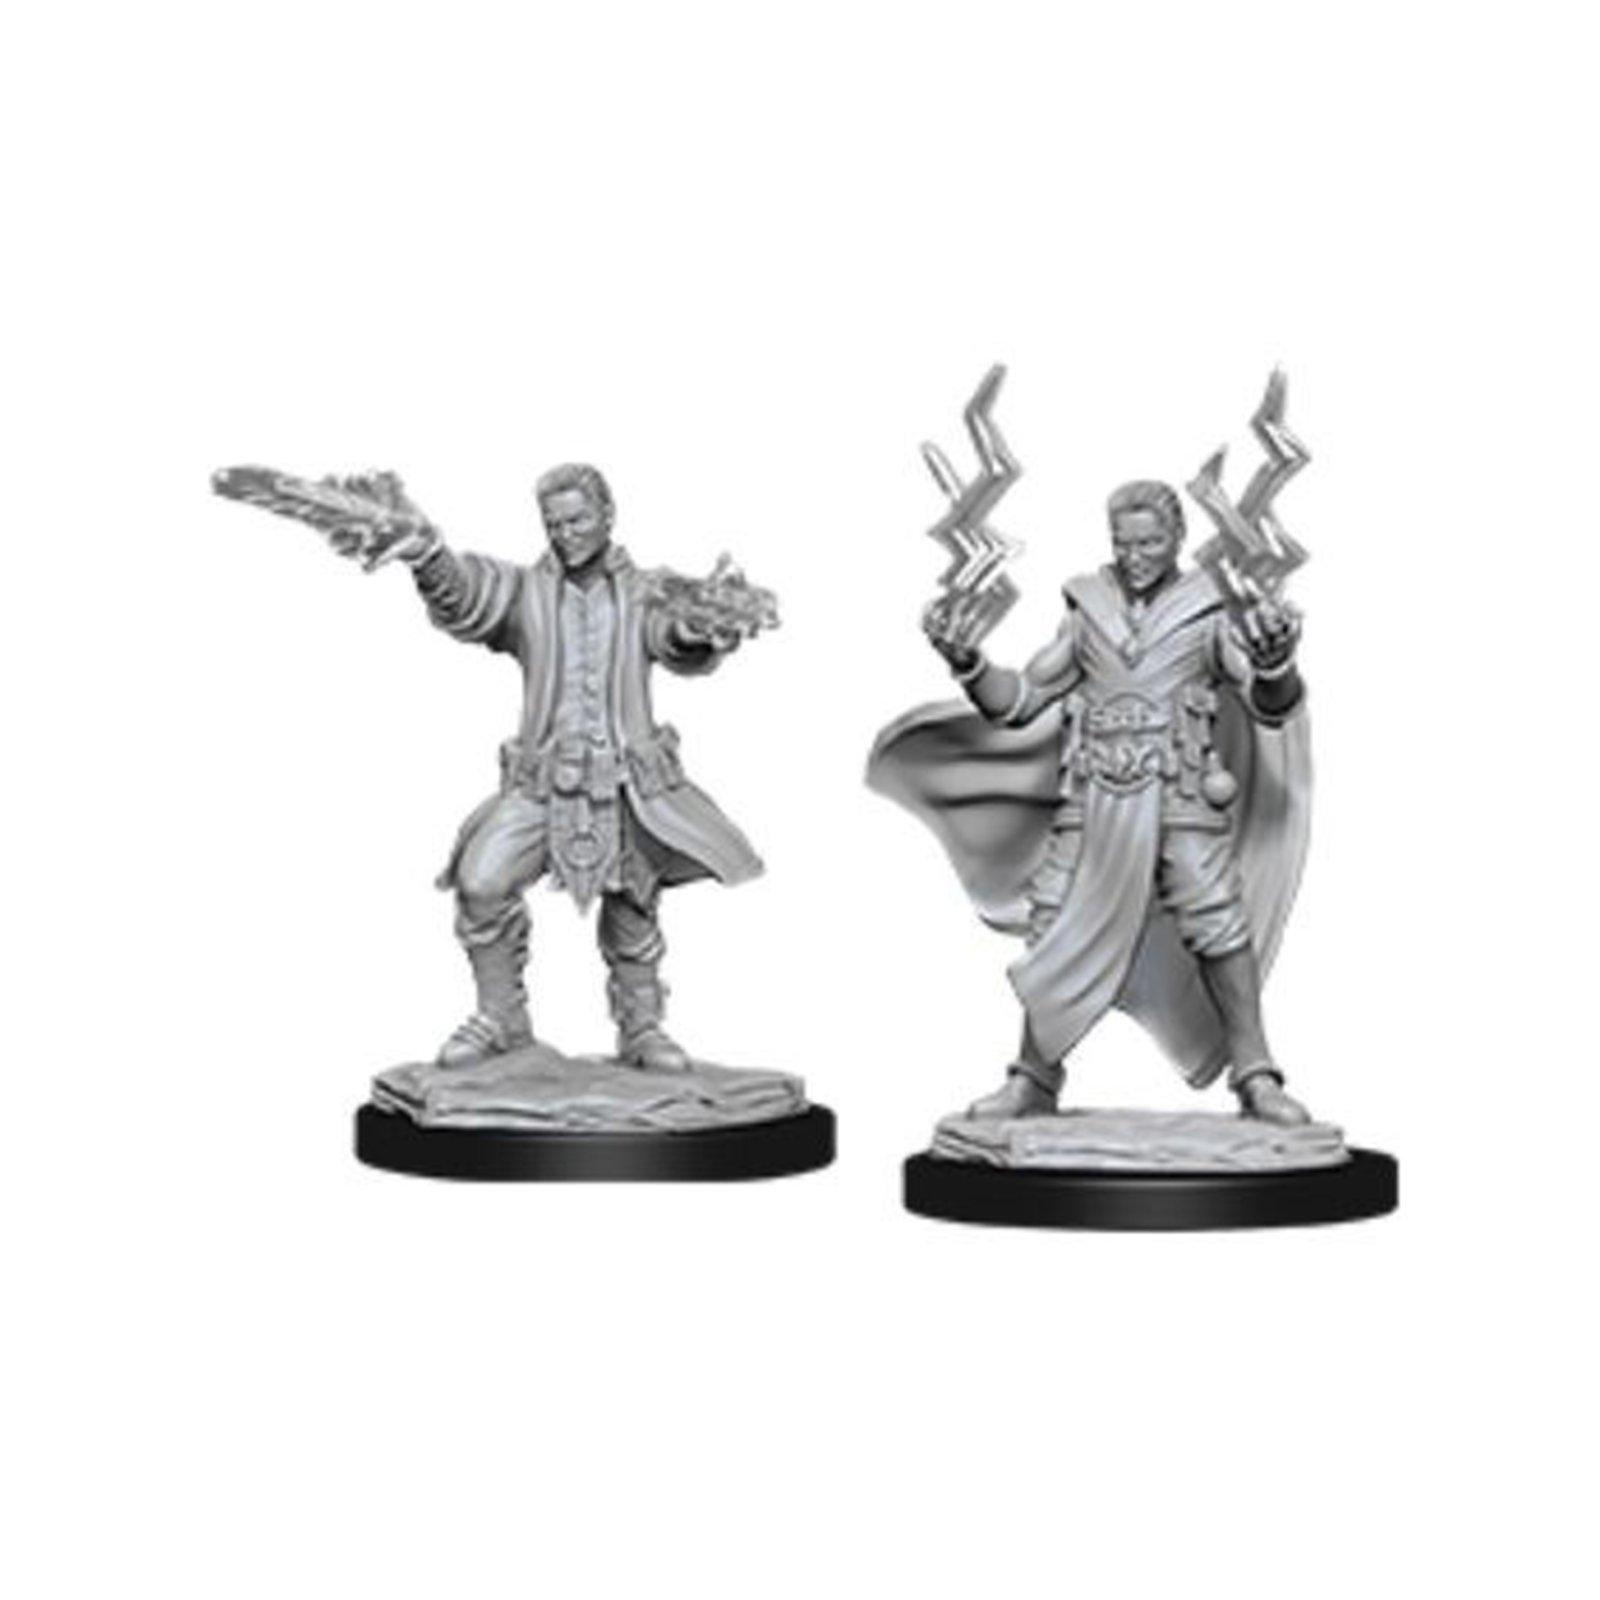 D&D Nolzur´s Human Sorcerer Male miniatuurid